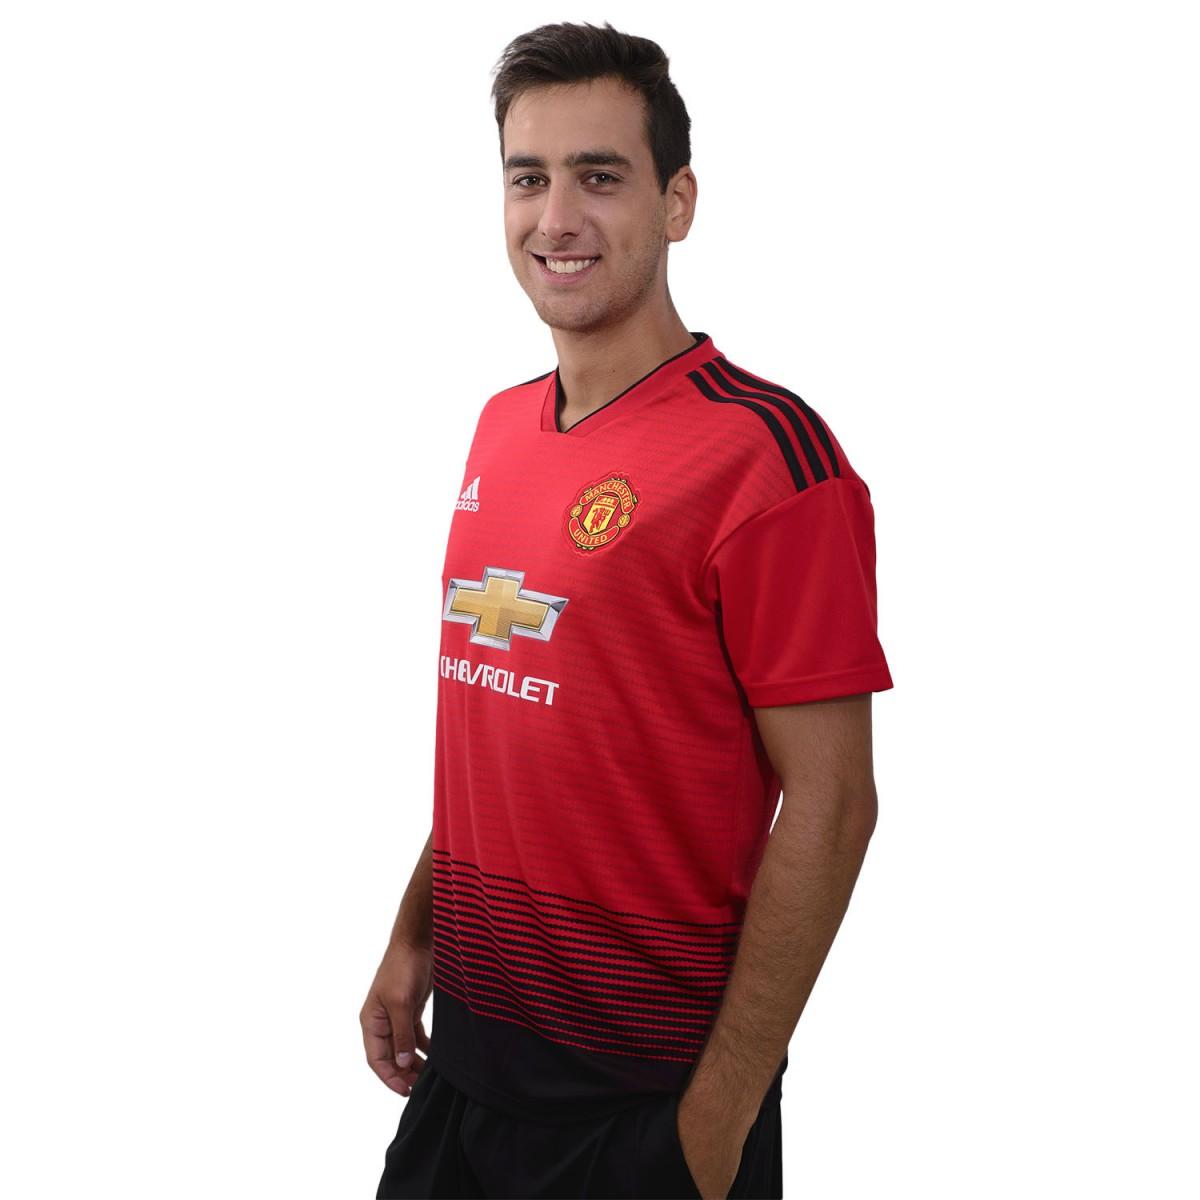 44c5aece Camiseta Adidas Manchester United Home 2018/2019 - Fútbol europeo